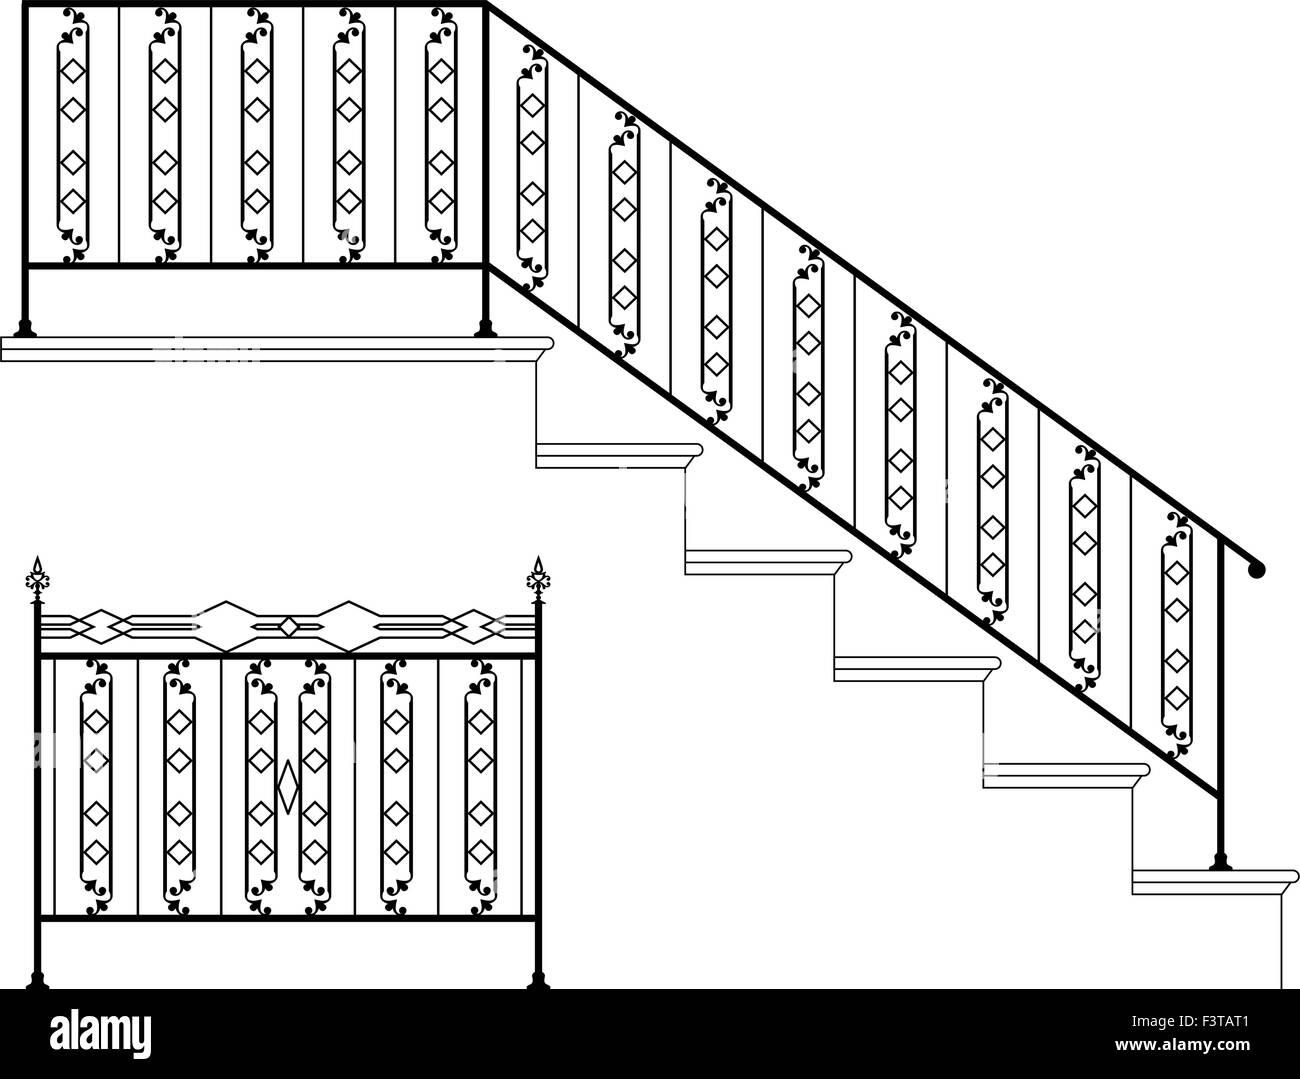 Wrought Iron Stair Railing Design Vector Art